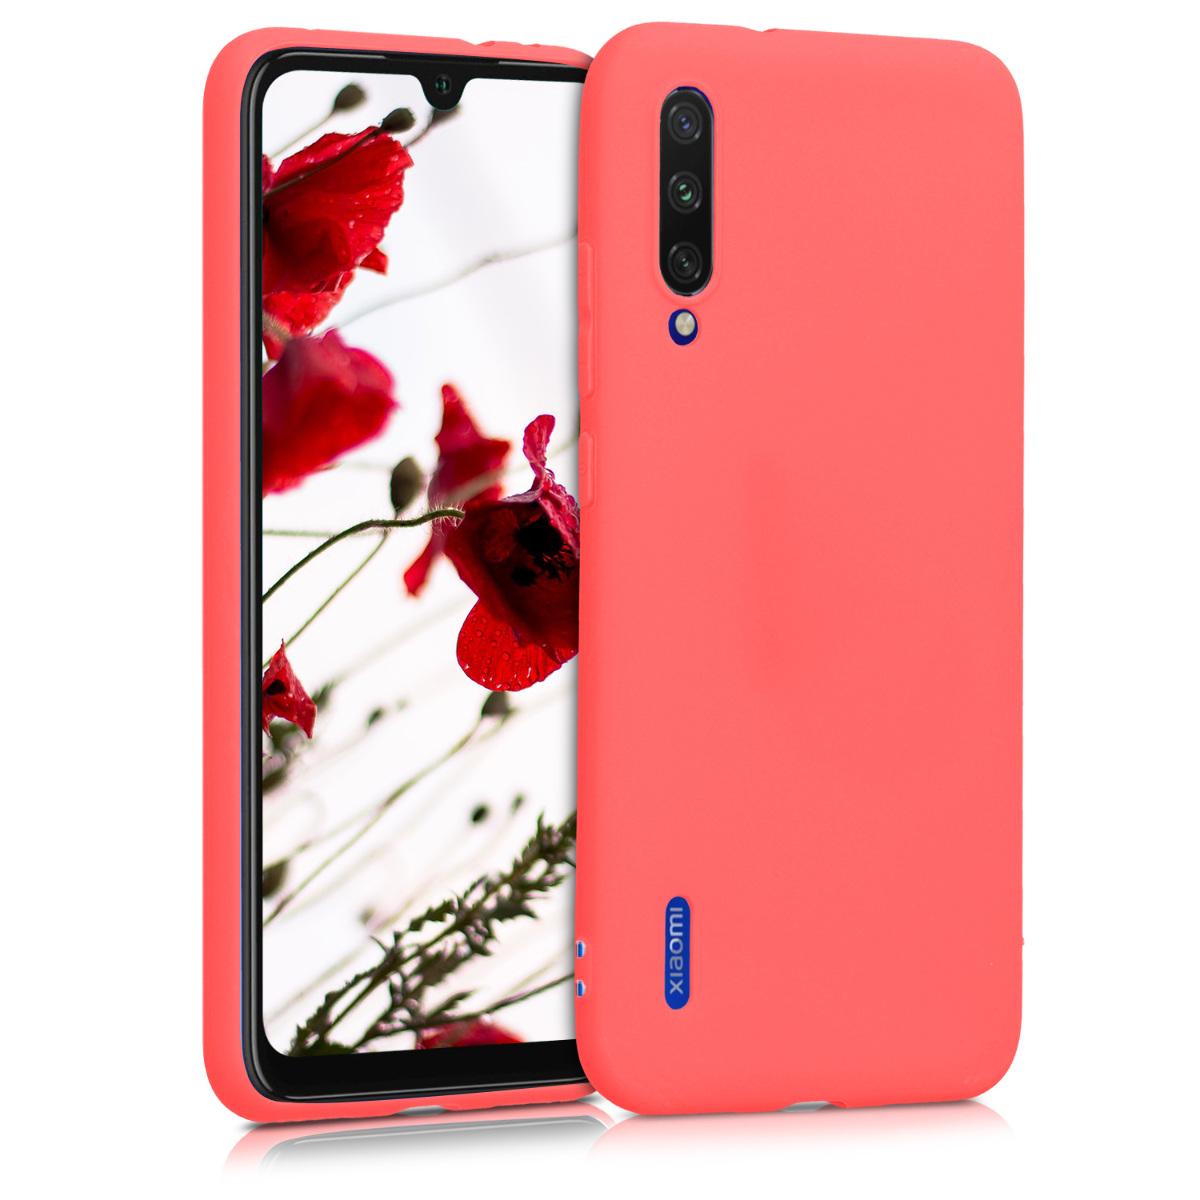 KW Θήκη Σιλικόνης Xiaomi Mi A3 - Living Coral (49674.141)